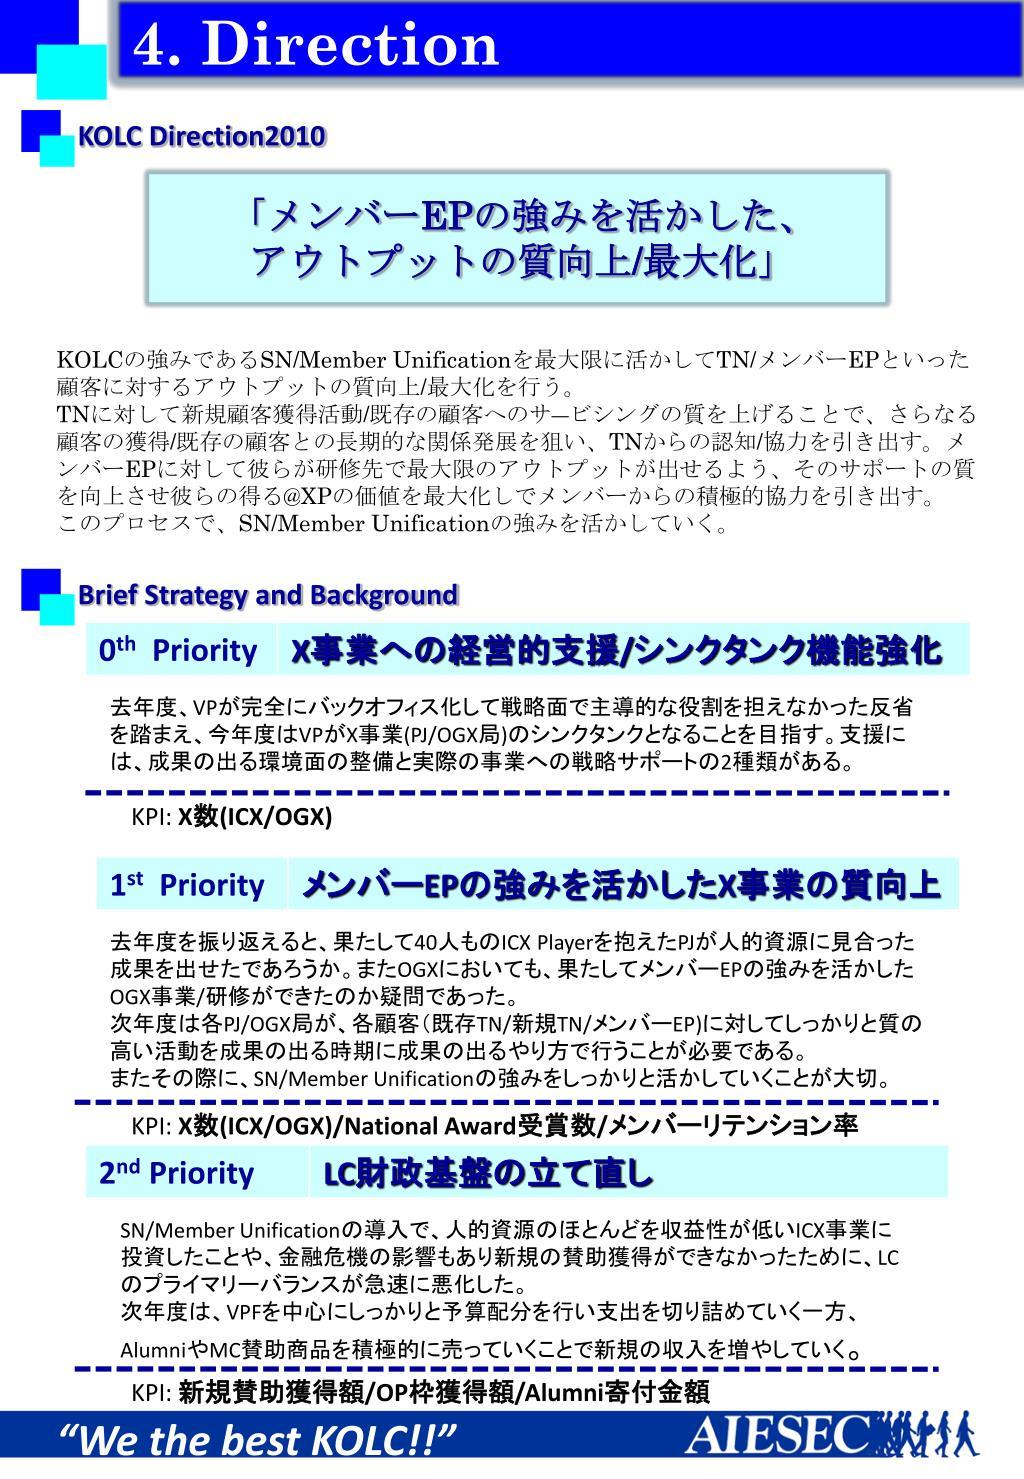 4. Direction